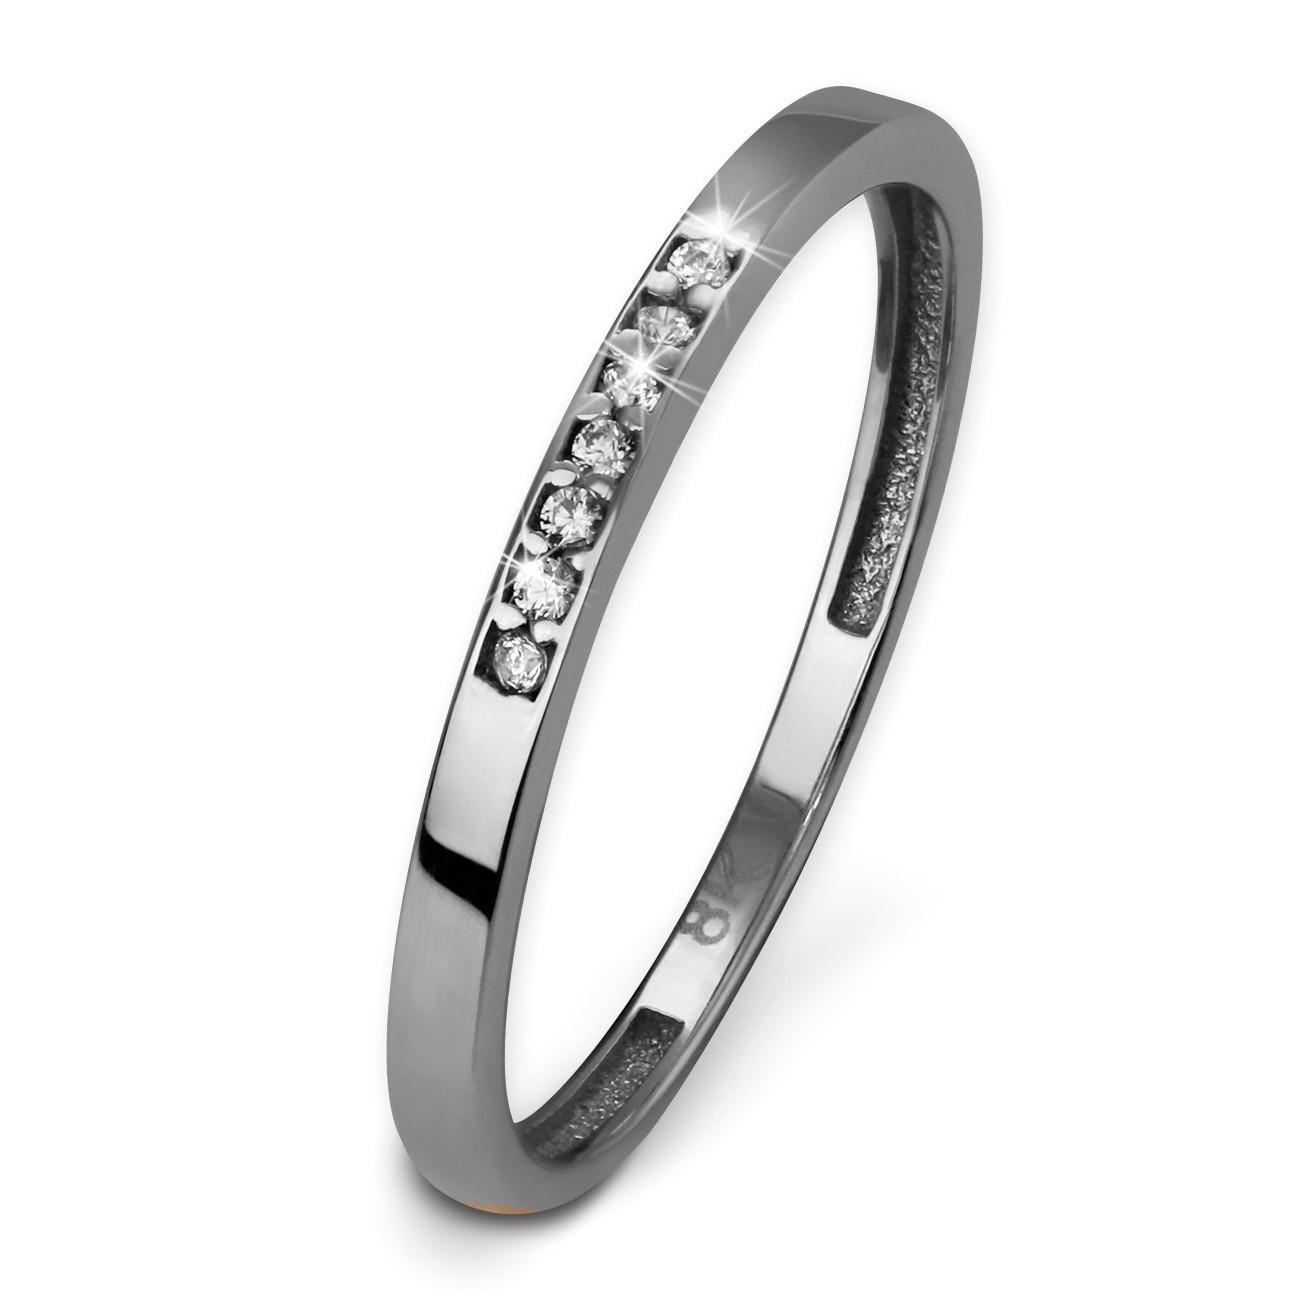 GoldDream Gold Ring Zirkonia weiß Gr.58 333er Weißgold GDR502J58